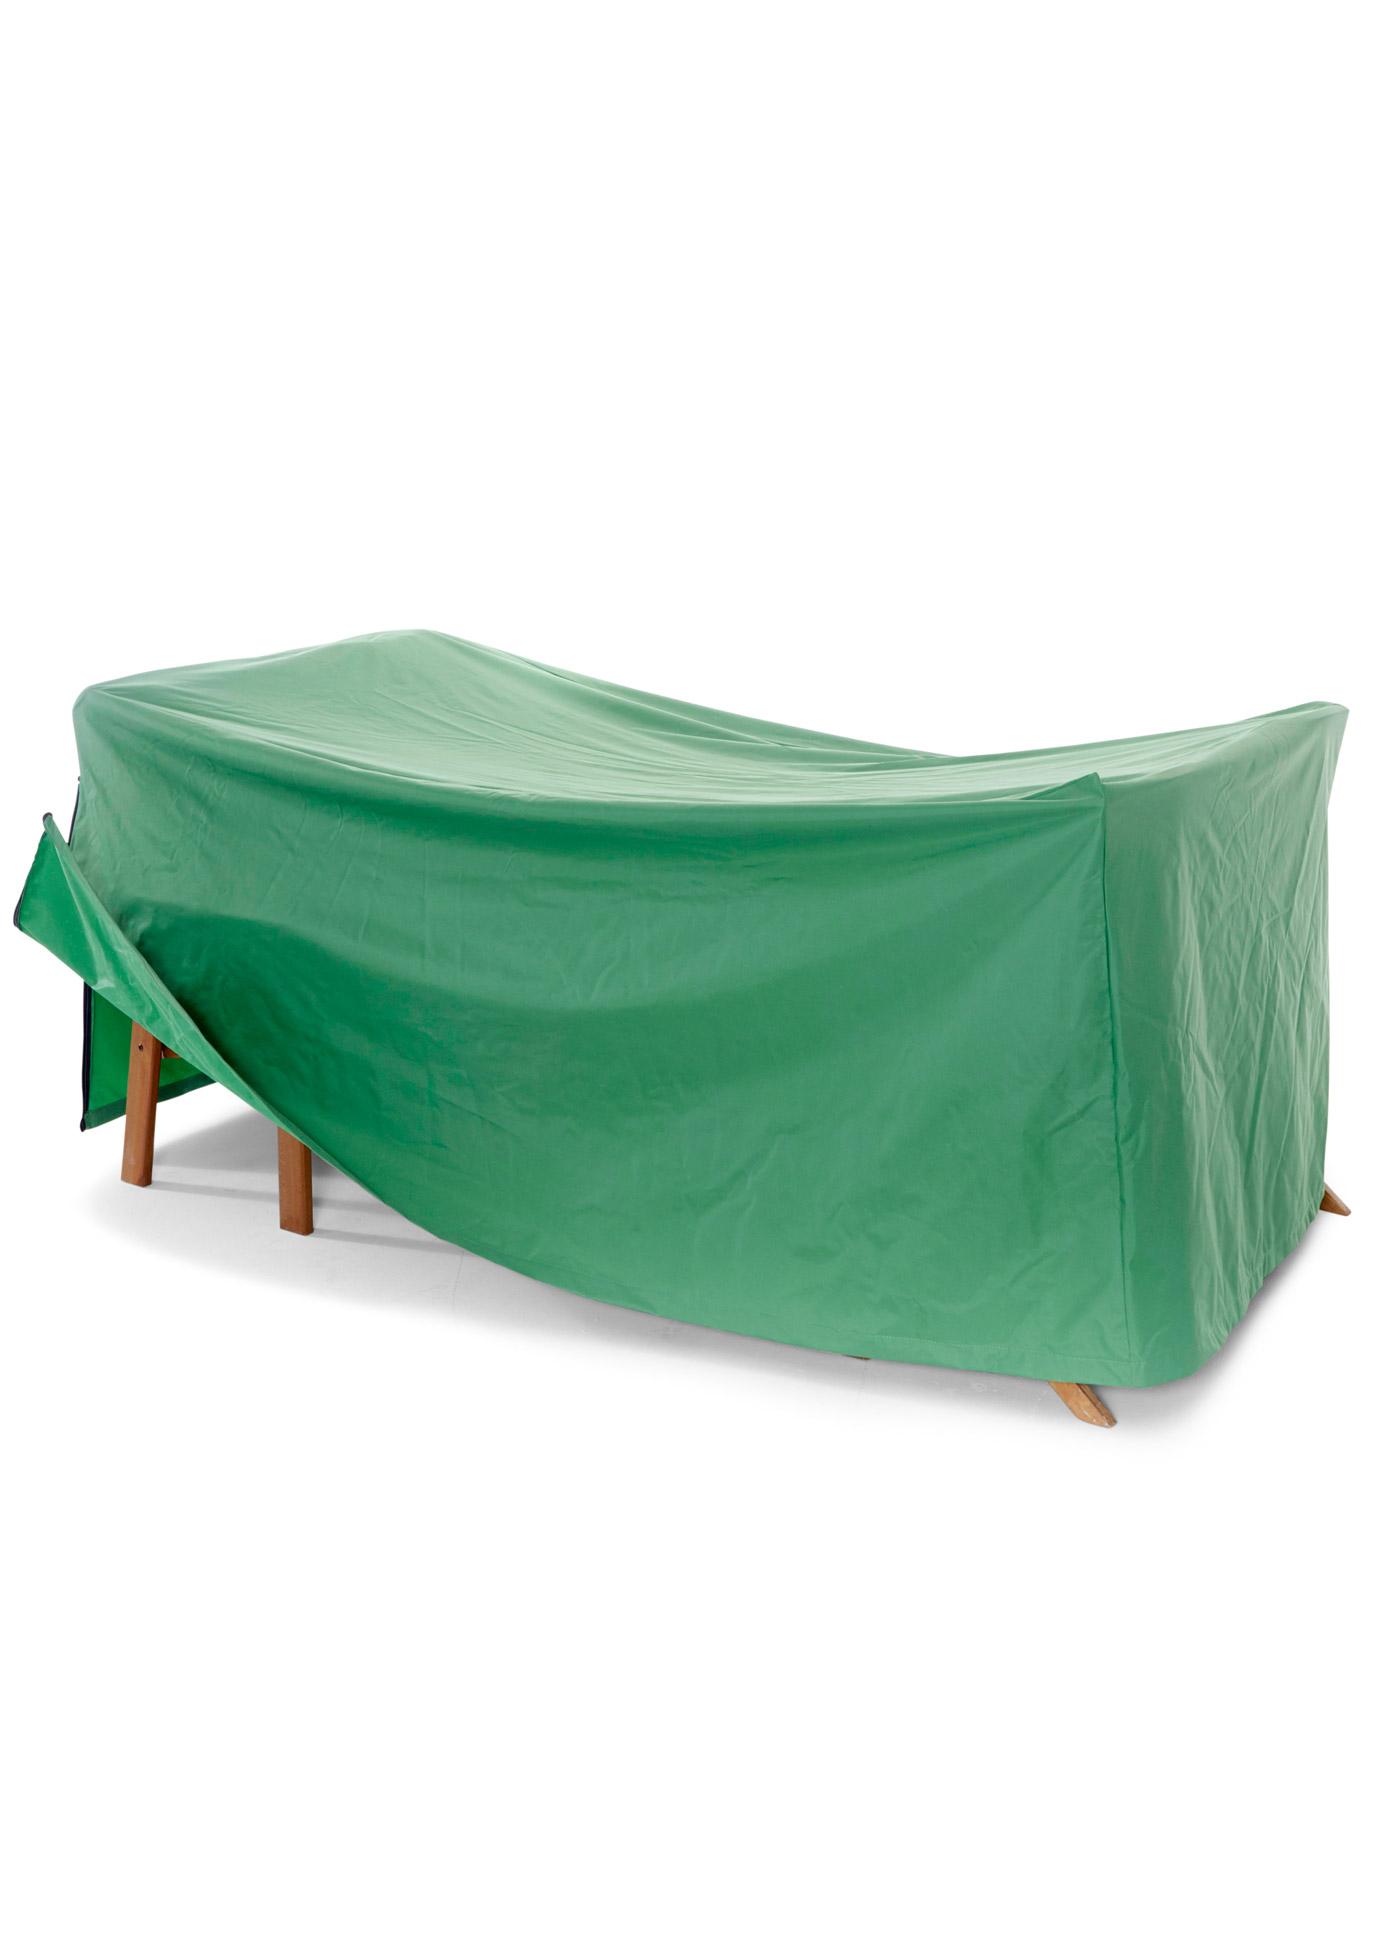 gartenmoebel set bpc living preisvergleiche. Black Bedroom Furniture Sets. Home Design Ideas